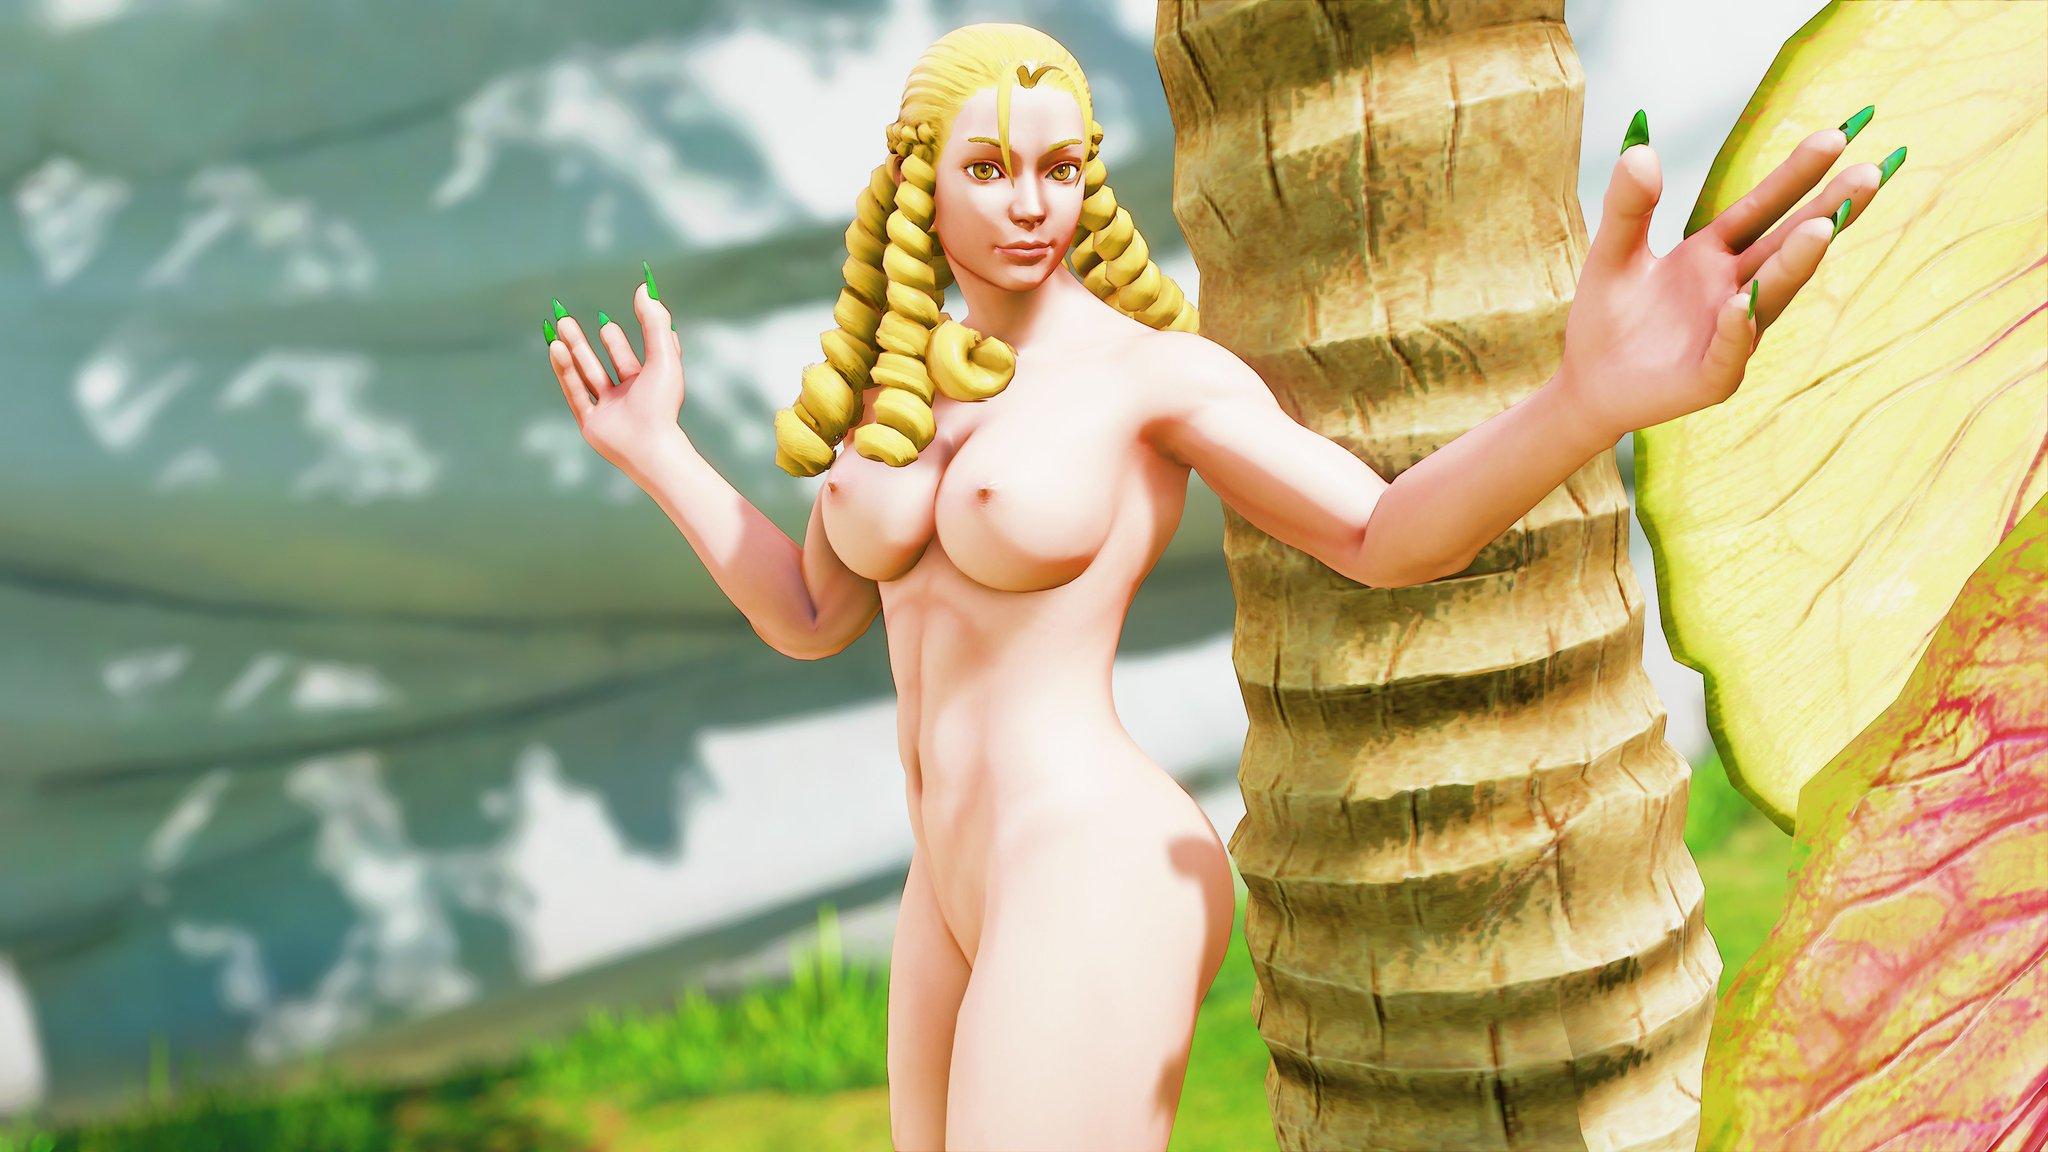 Hot Nude karin goddess nudes